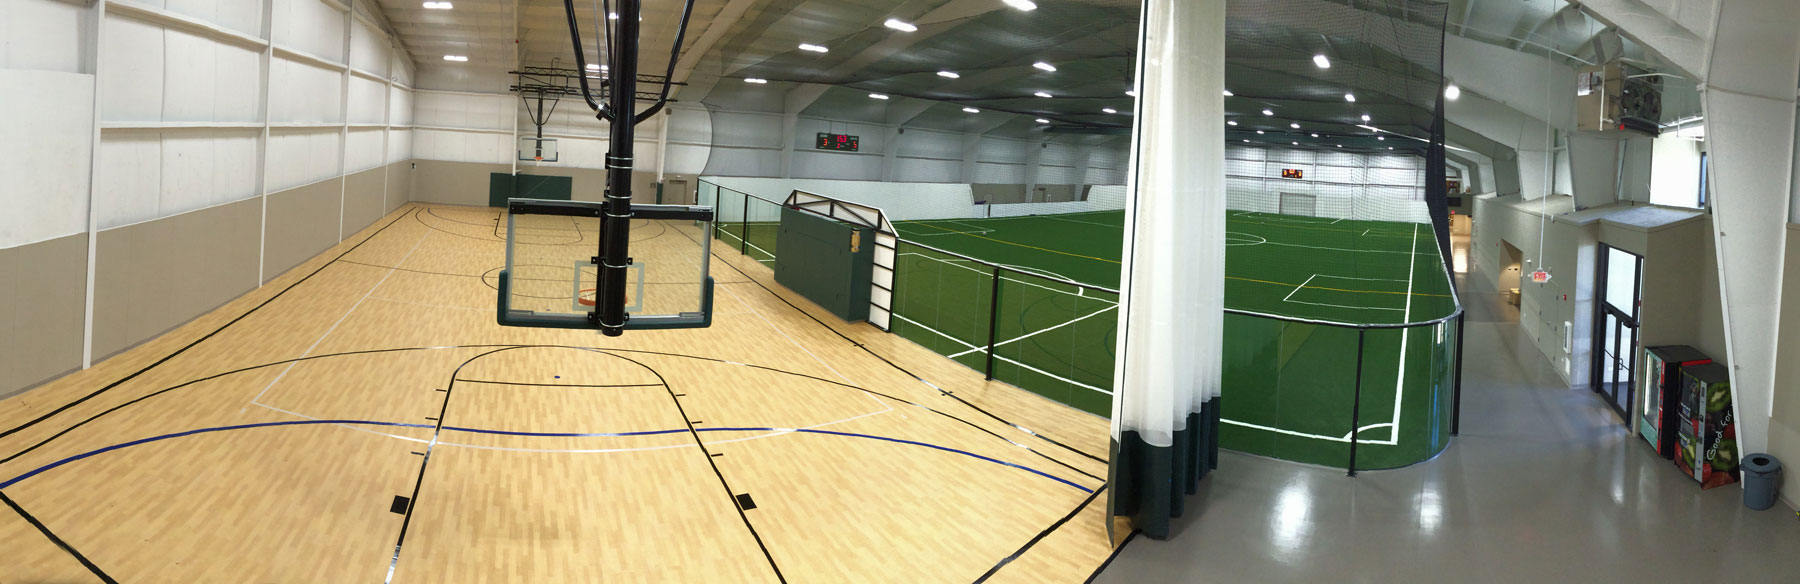 fe62898ece9e8 Aurora Area Sports Alliance - Sports Facilities